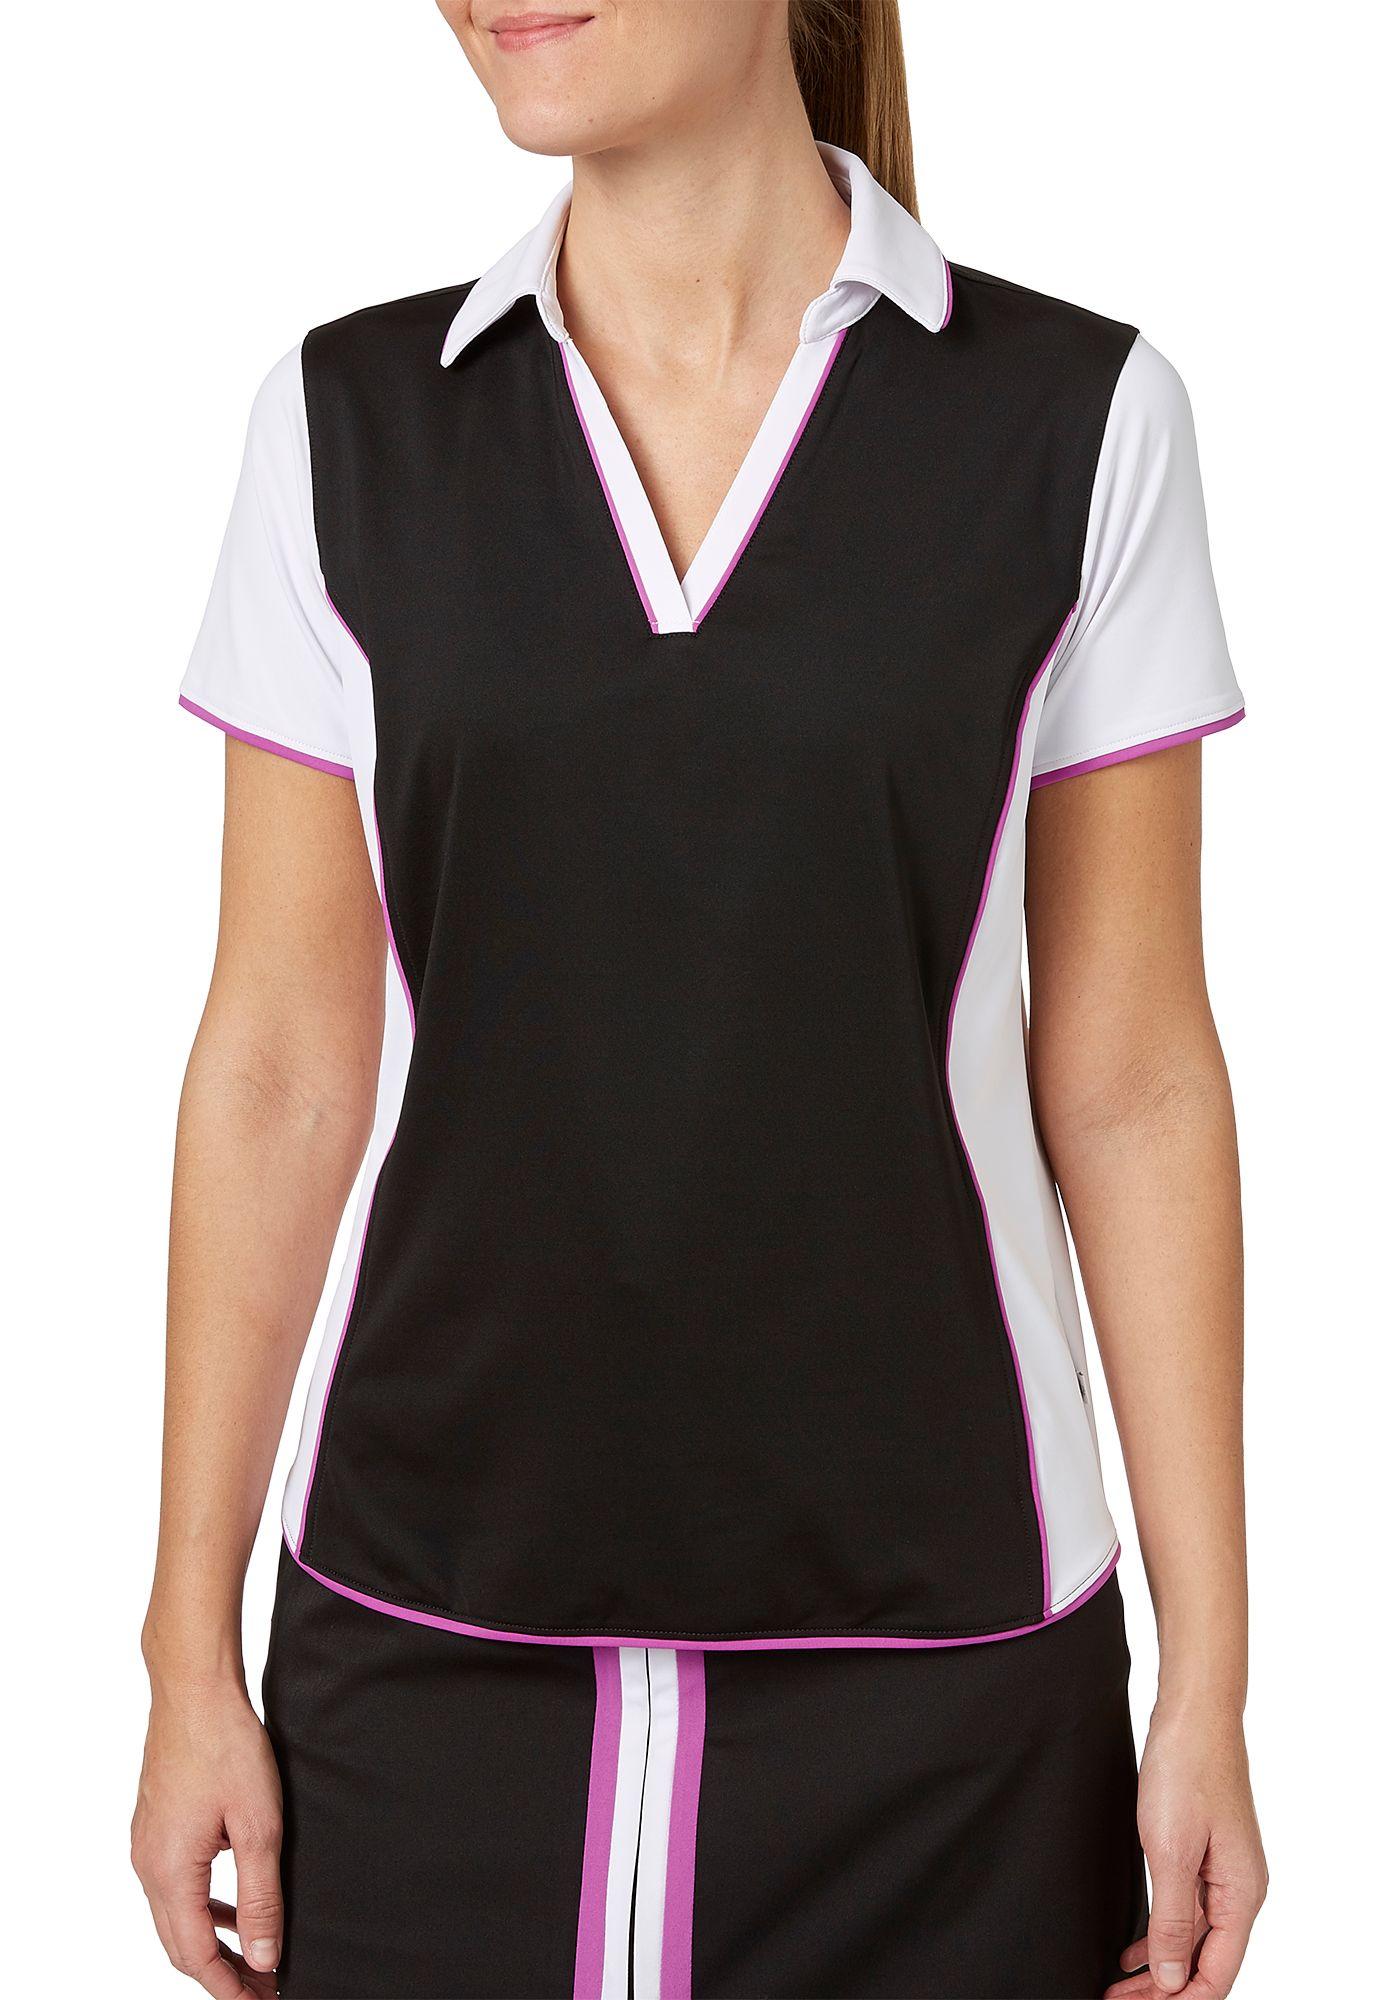 Lady Hagen Women's Twilight Collection Colorblock Short Sleeve Golf Polo